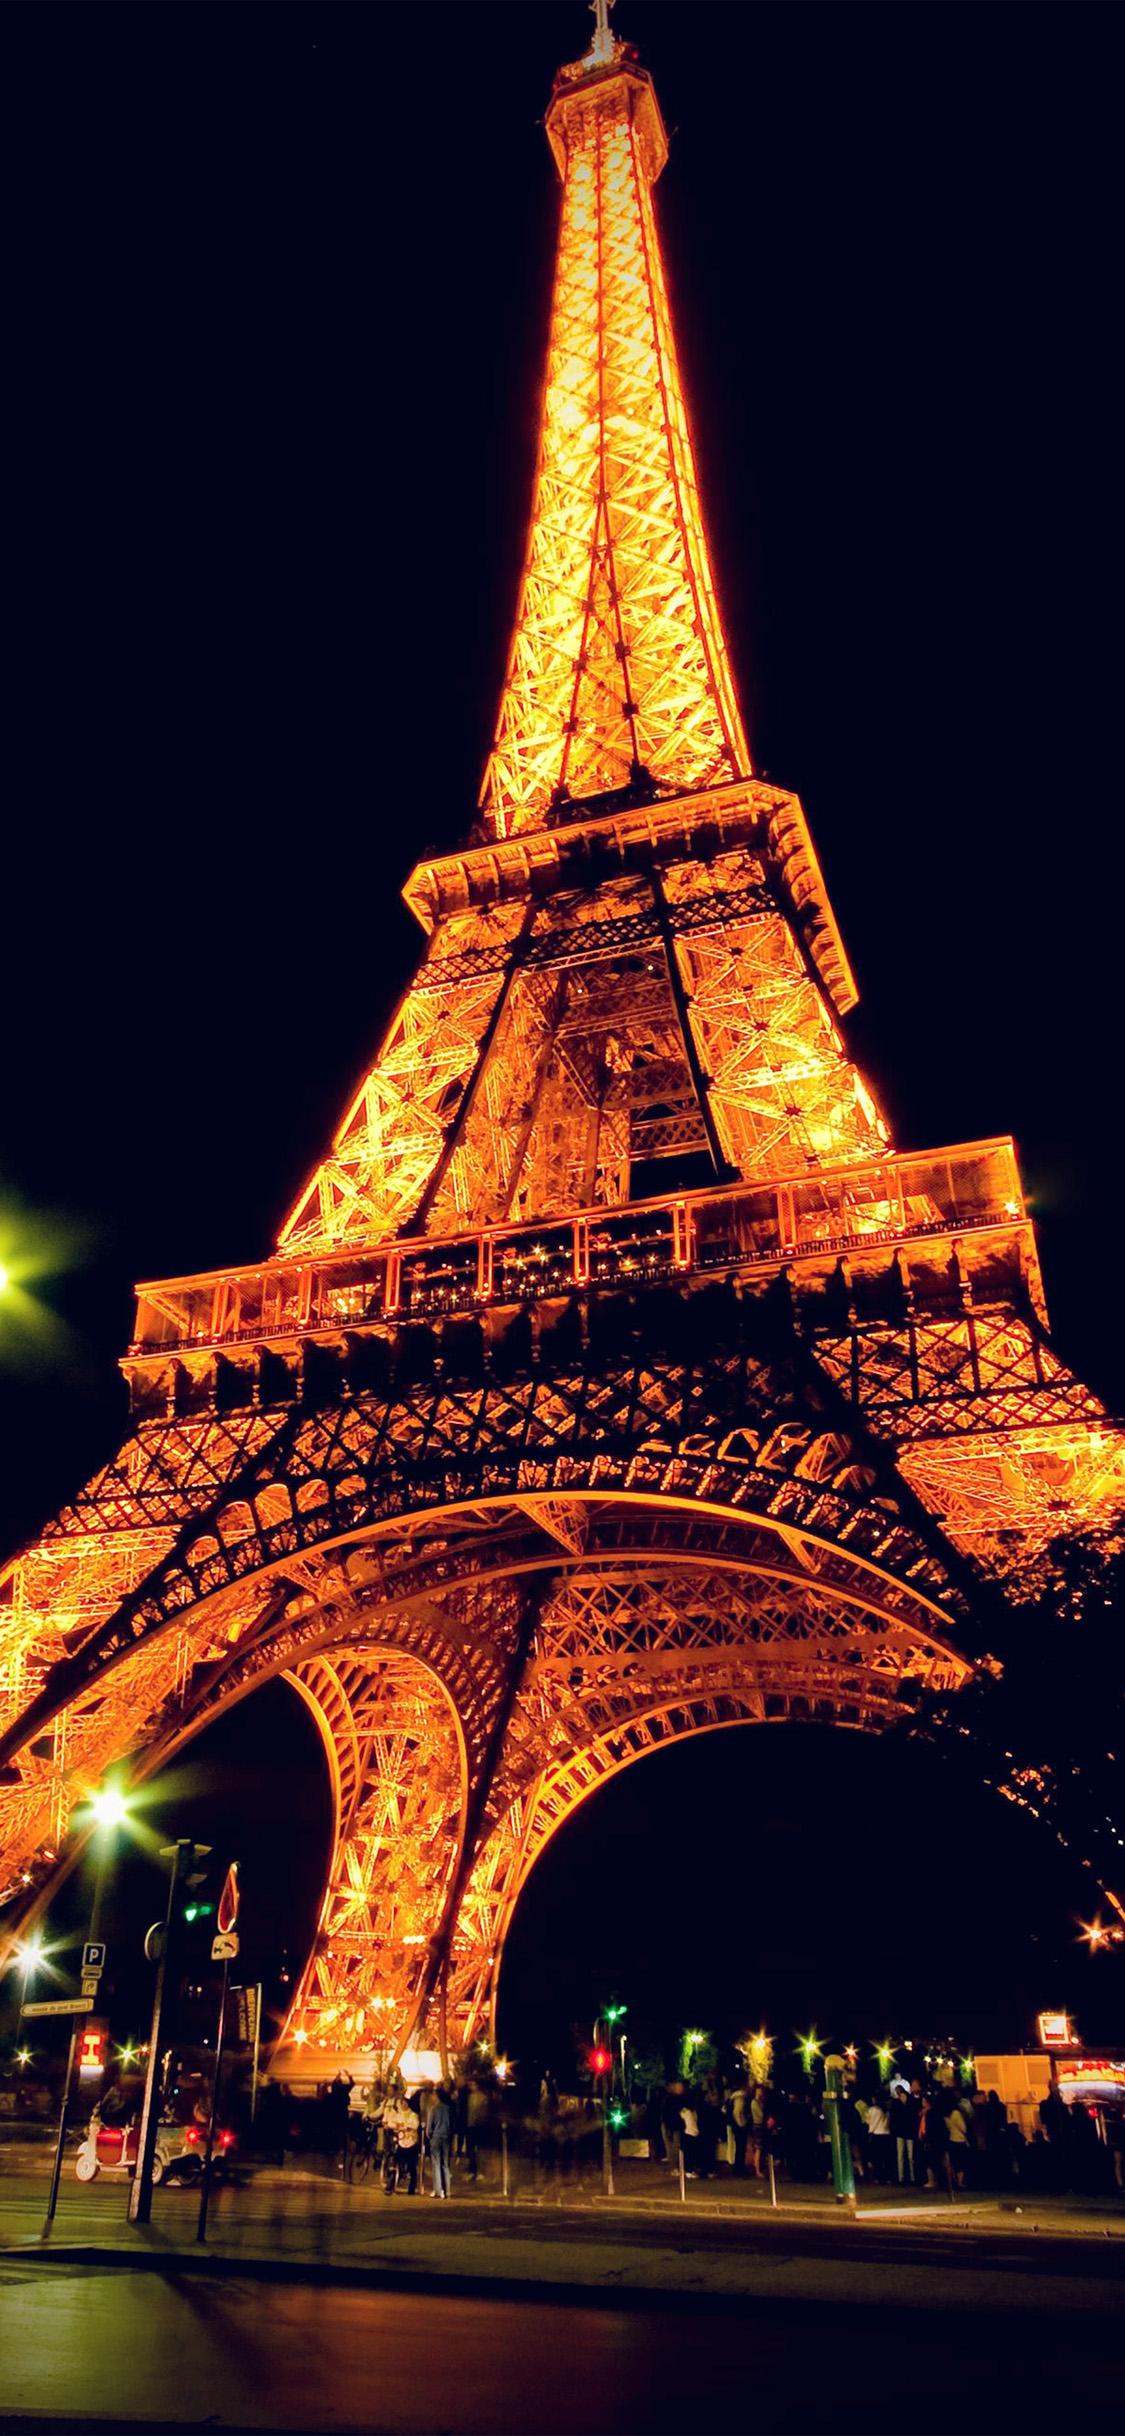 Htc Black Wallpaper Bc23 Eiffel Tower Paris Night Art Illustration Wallpaper